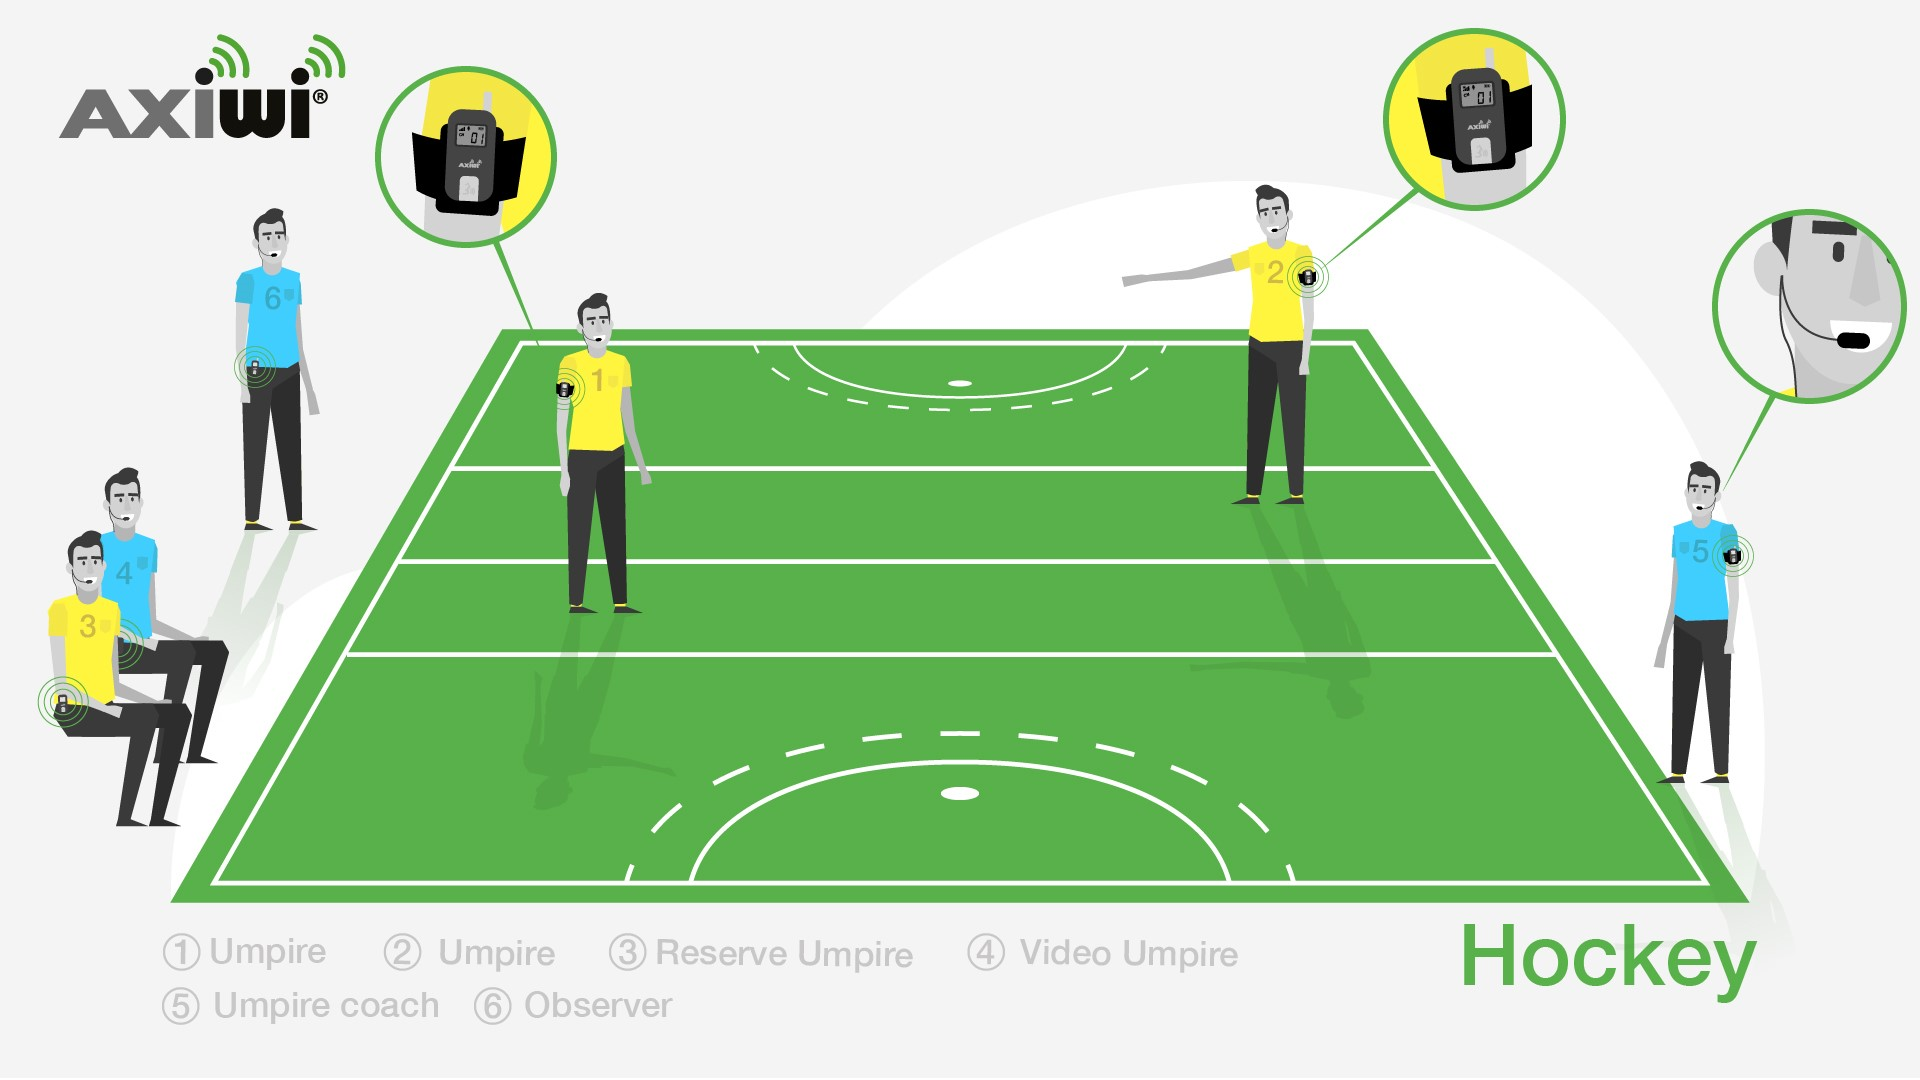 axiwi-scheidsrechter-communicatie-systeem-hockey